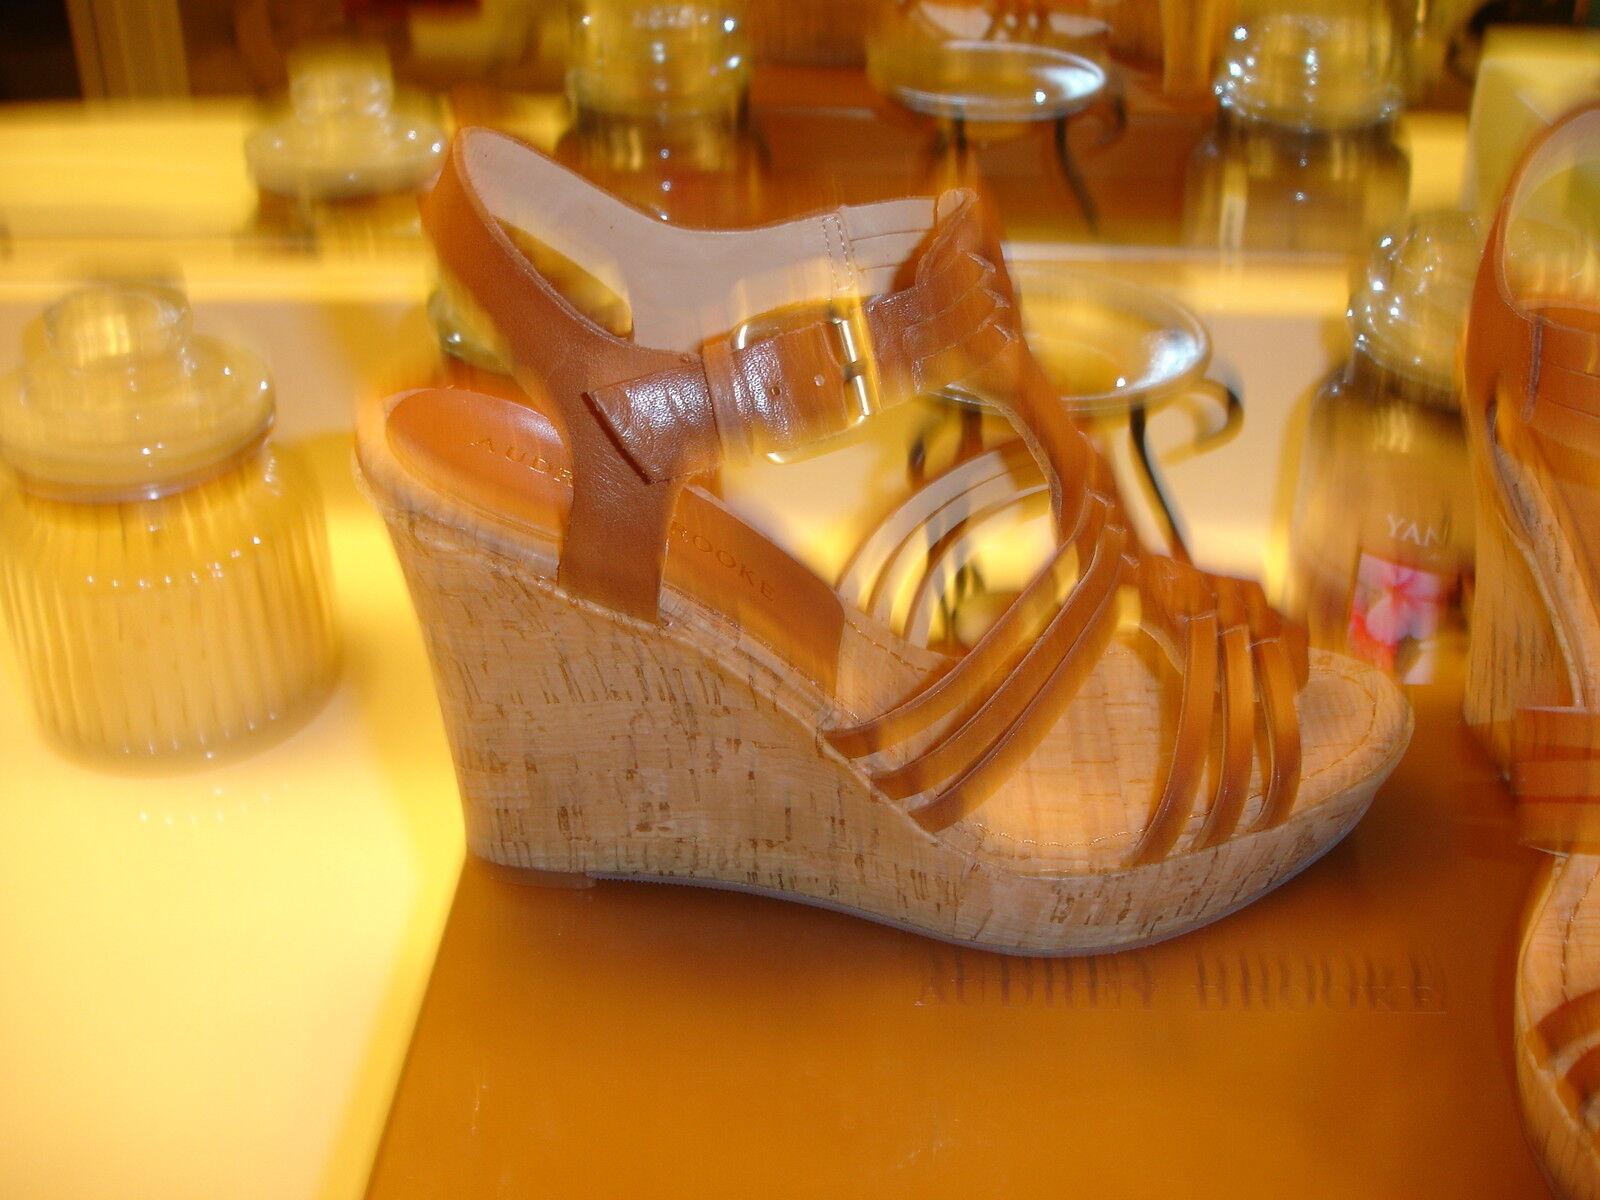 Audrey Brooke Carina Carina Carina braun leather Espadrille Heel 6.5 7 6  109 Sexy Styllish b90ee1